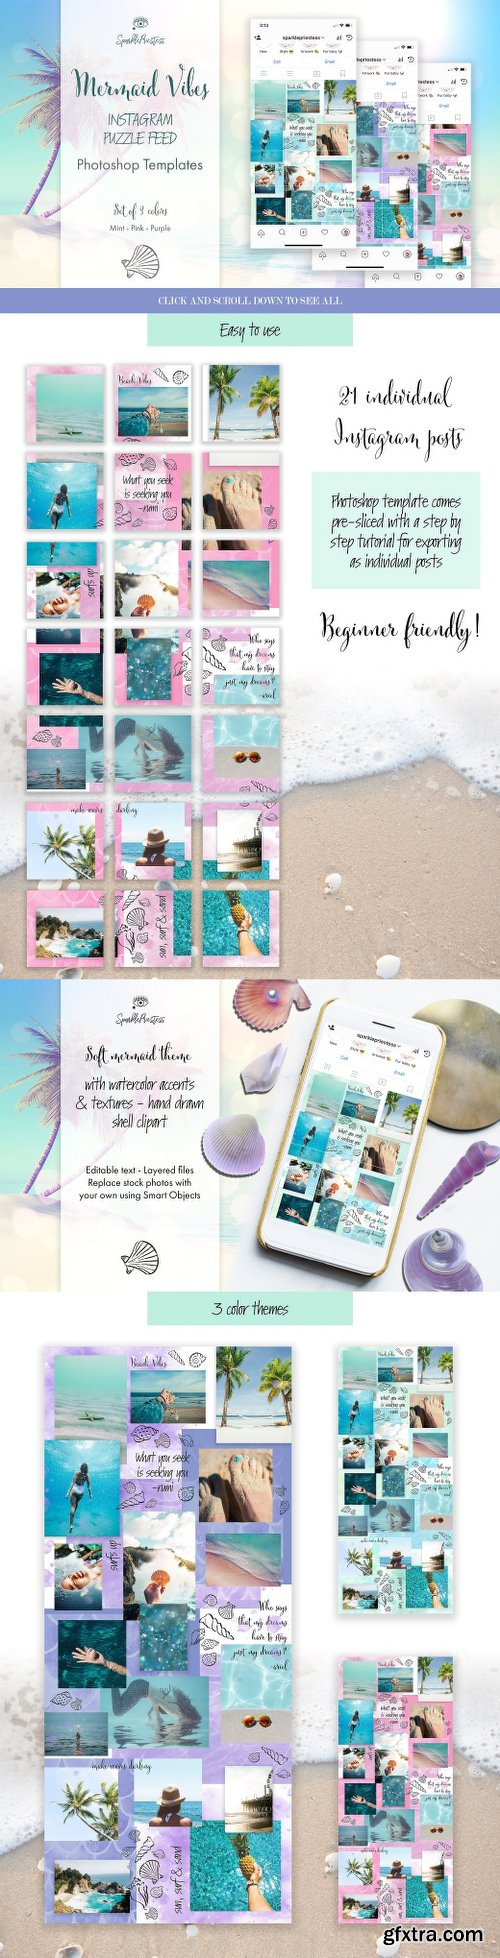 CreativeMarket Mermaid Vibes Instagram Puzzle Feed 2546799